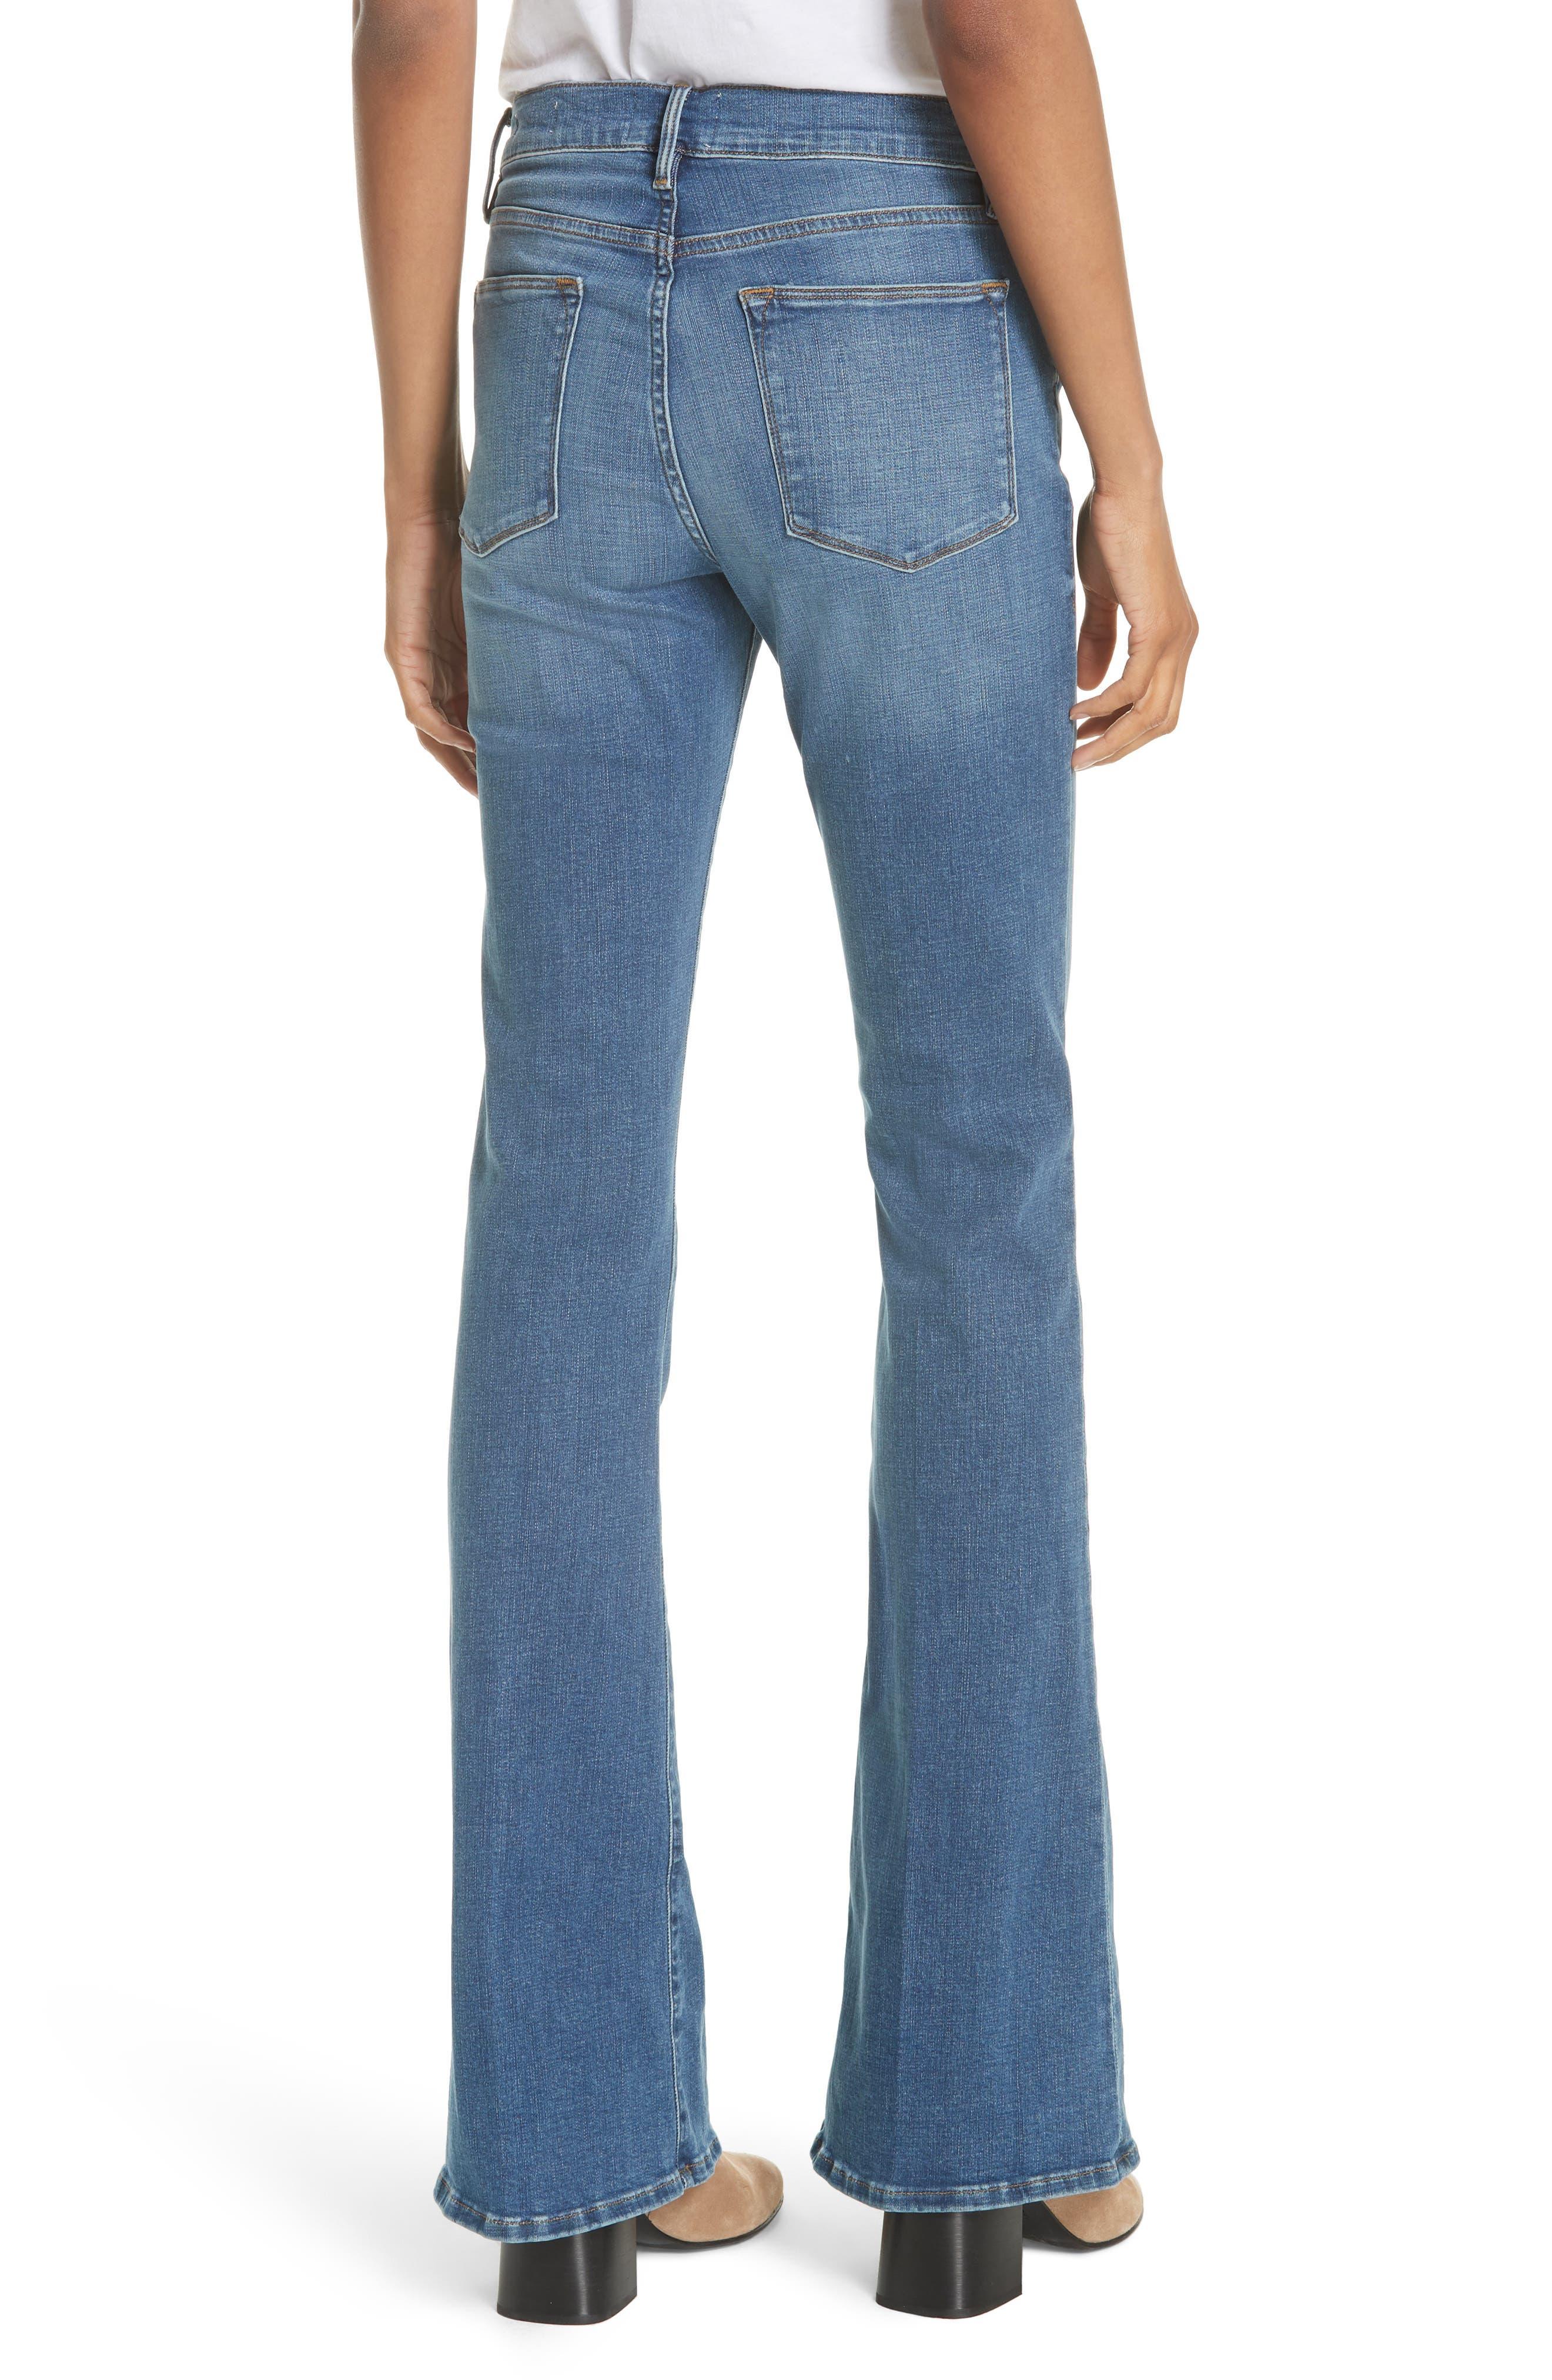 Alternate Image 2  - FRAME Le High Flare Jeans (Columbus)